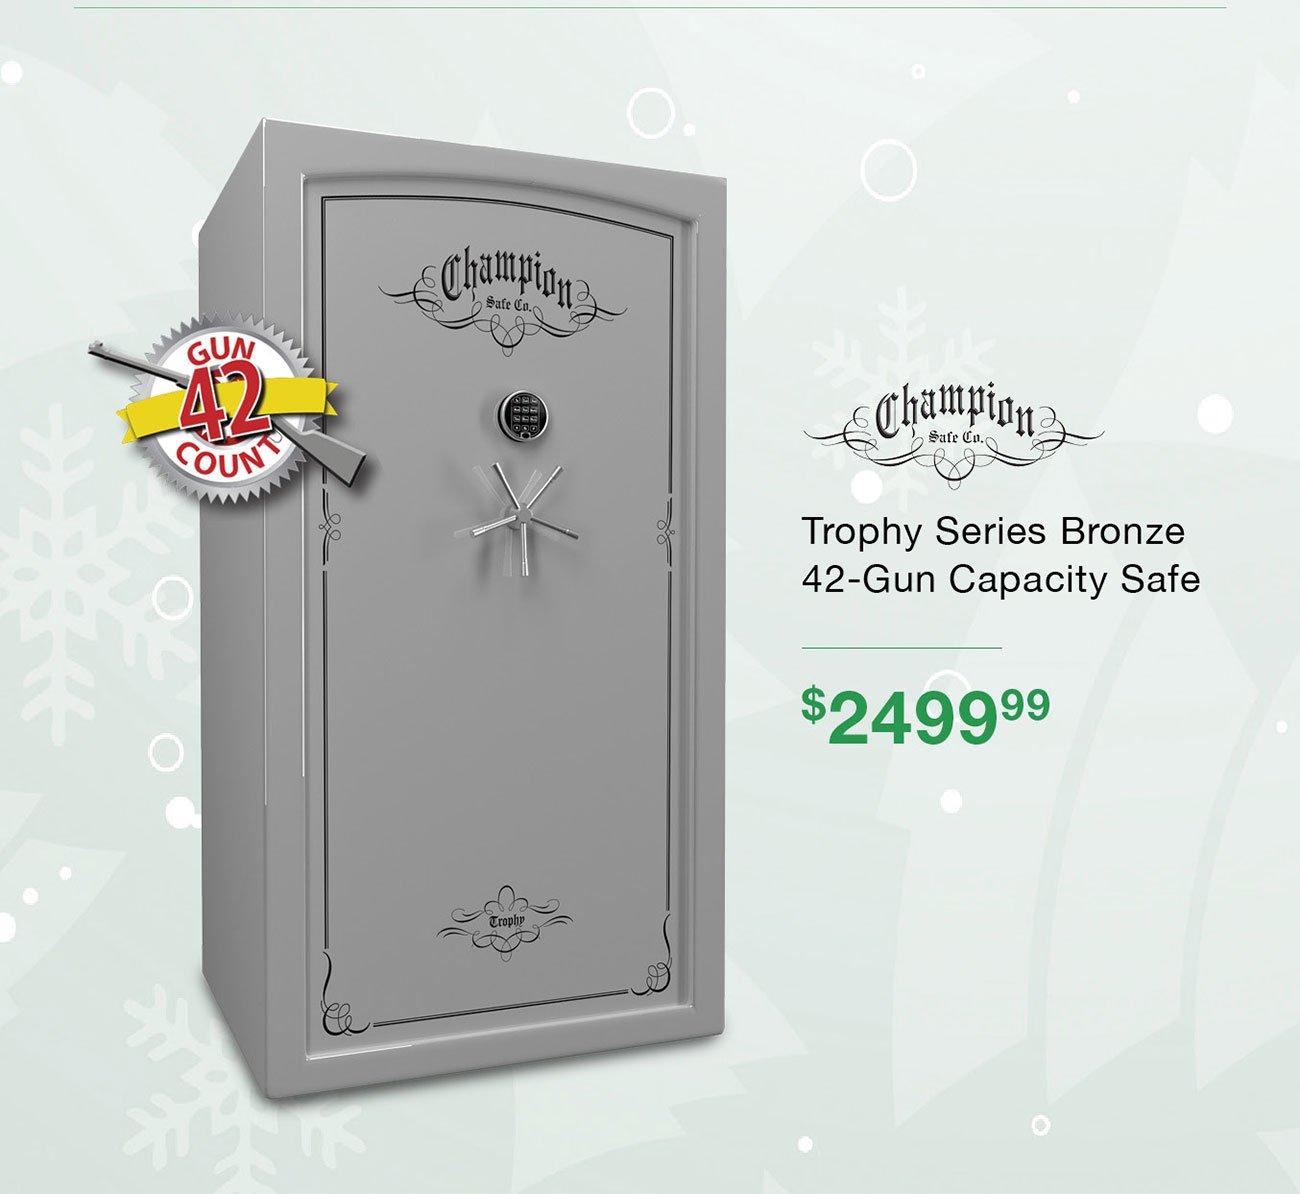 Champion-42-gun-safe